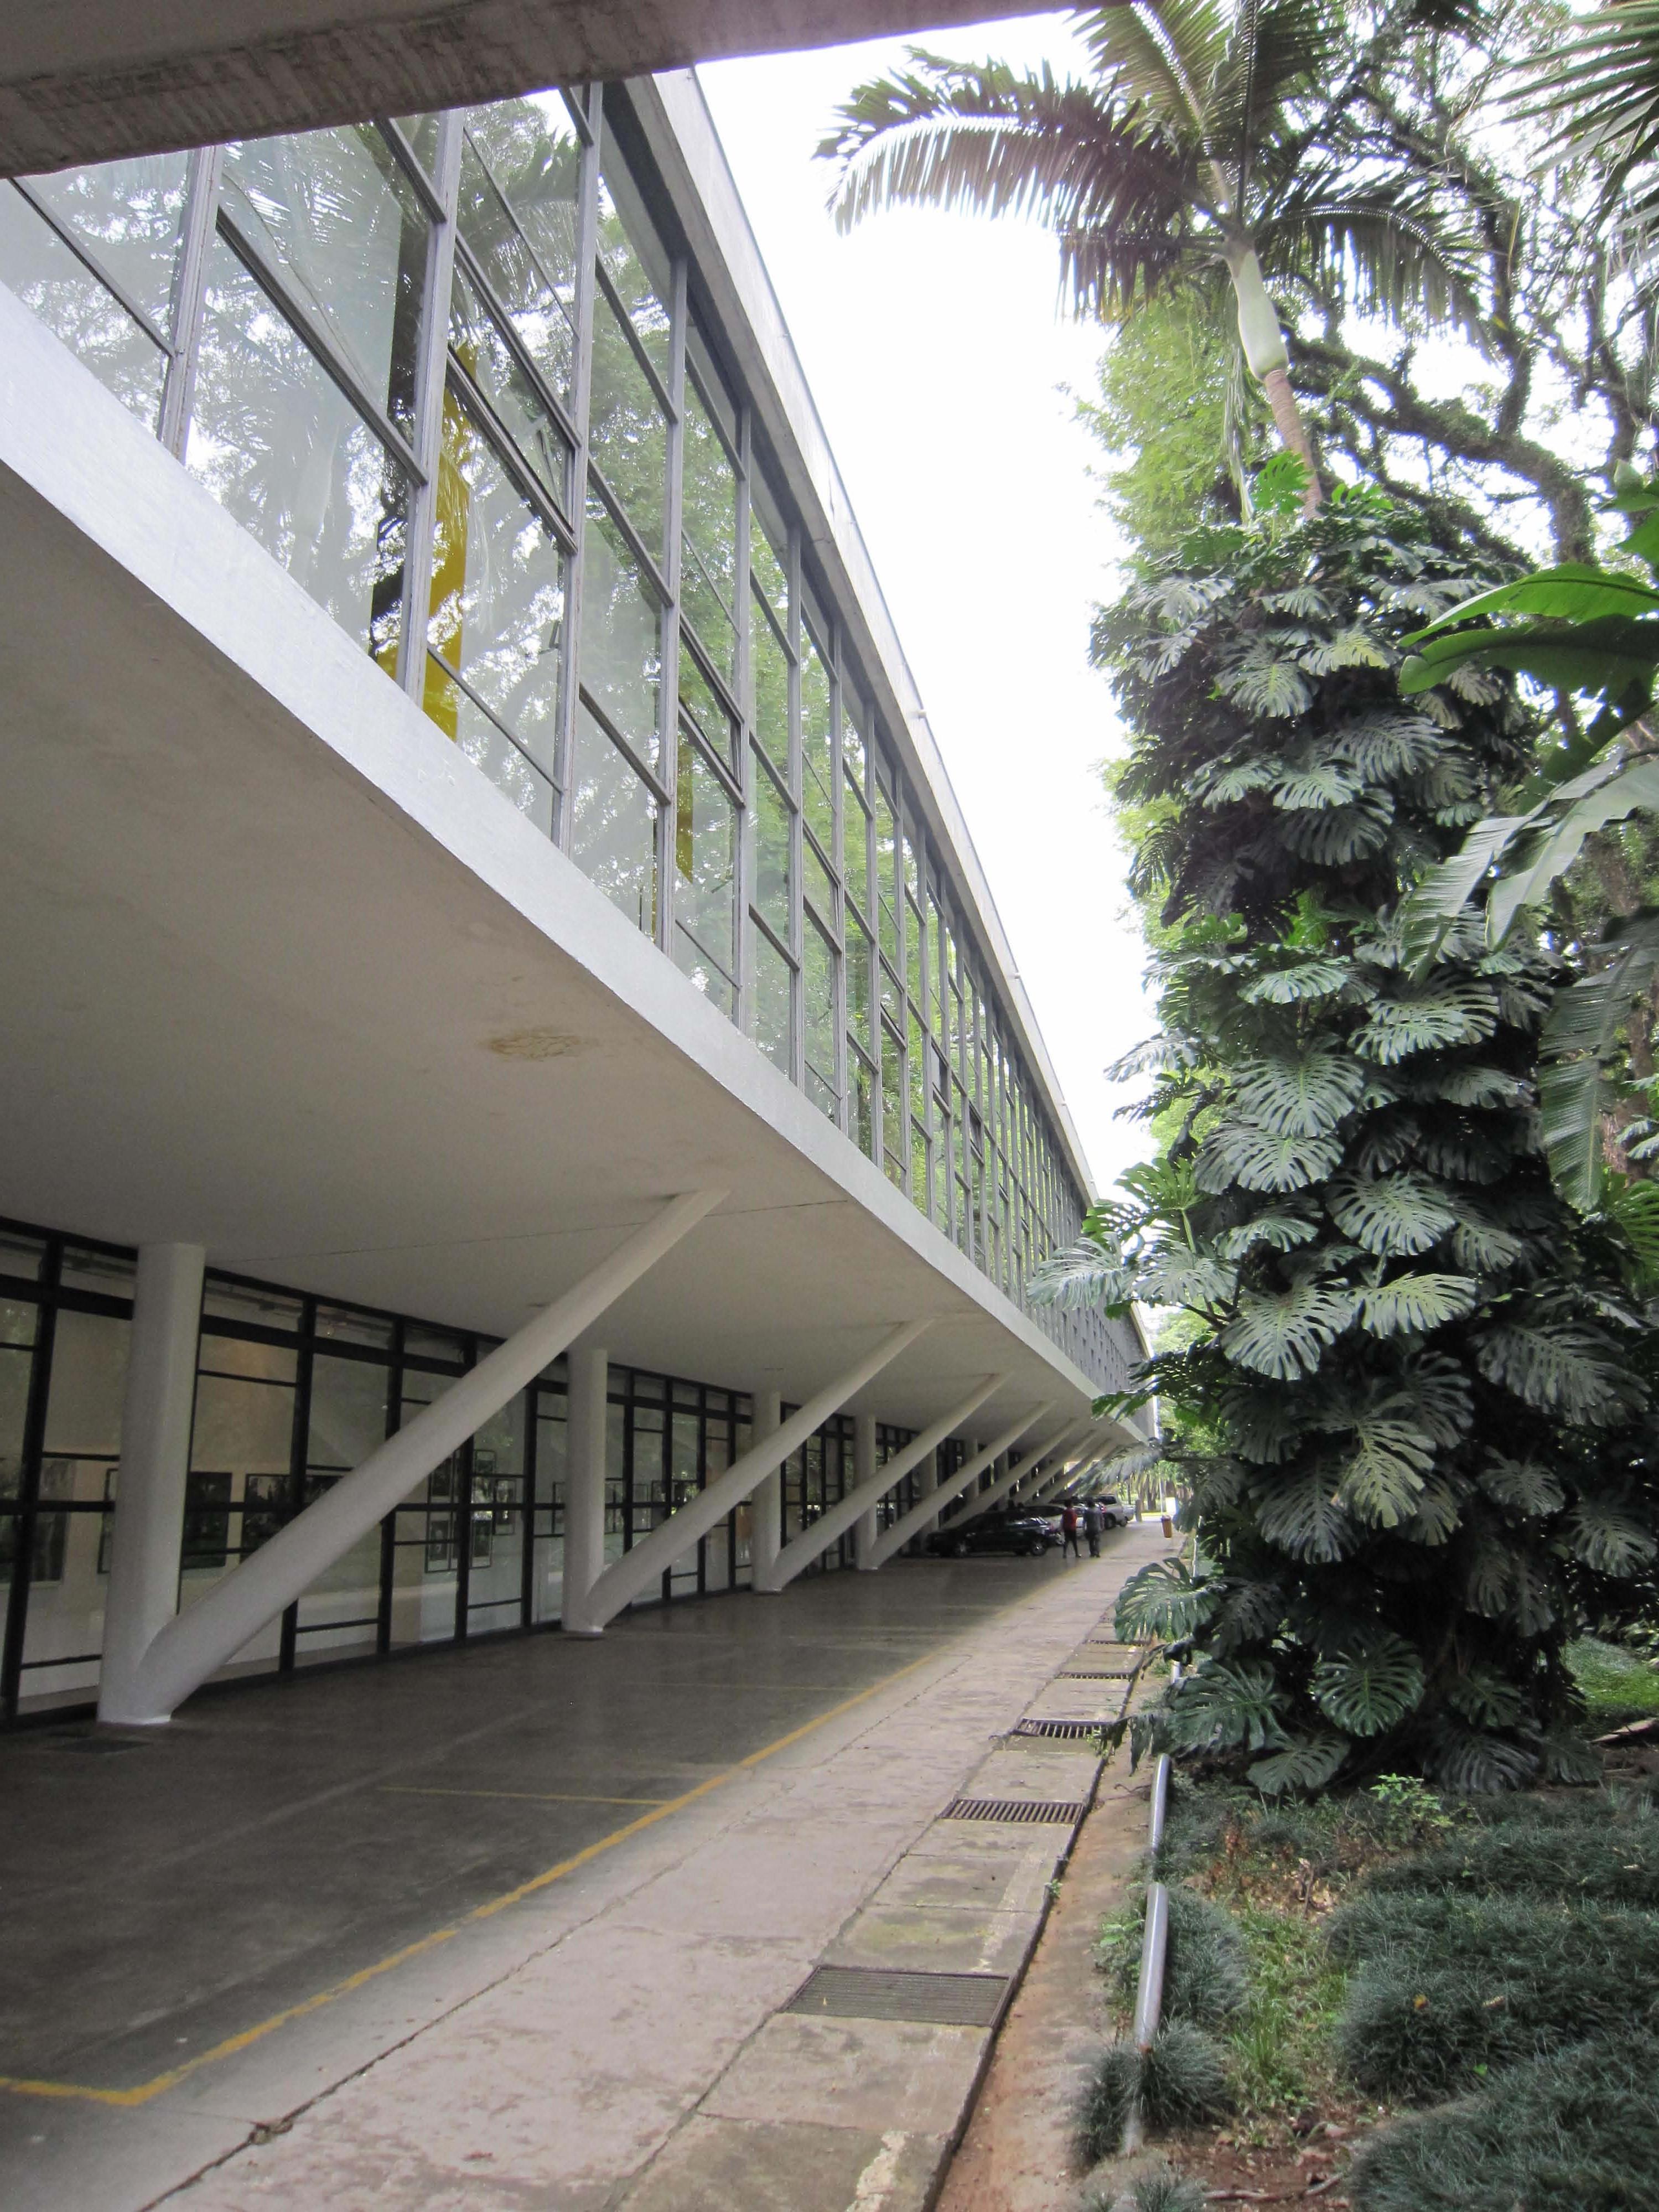 Niemeyer living on